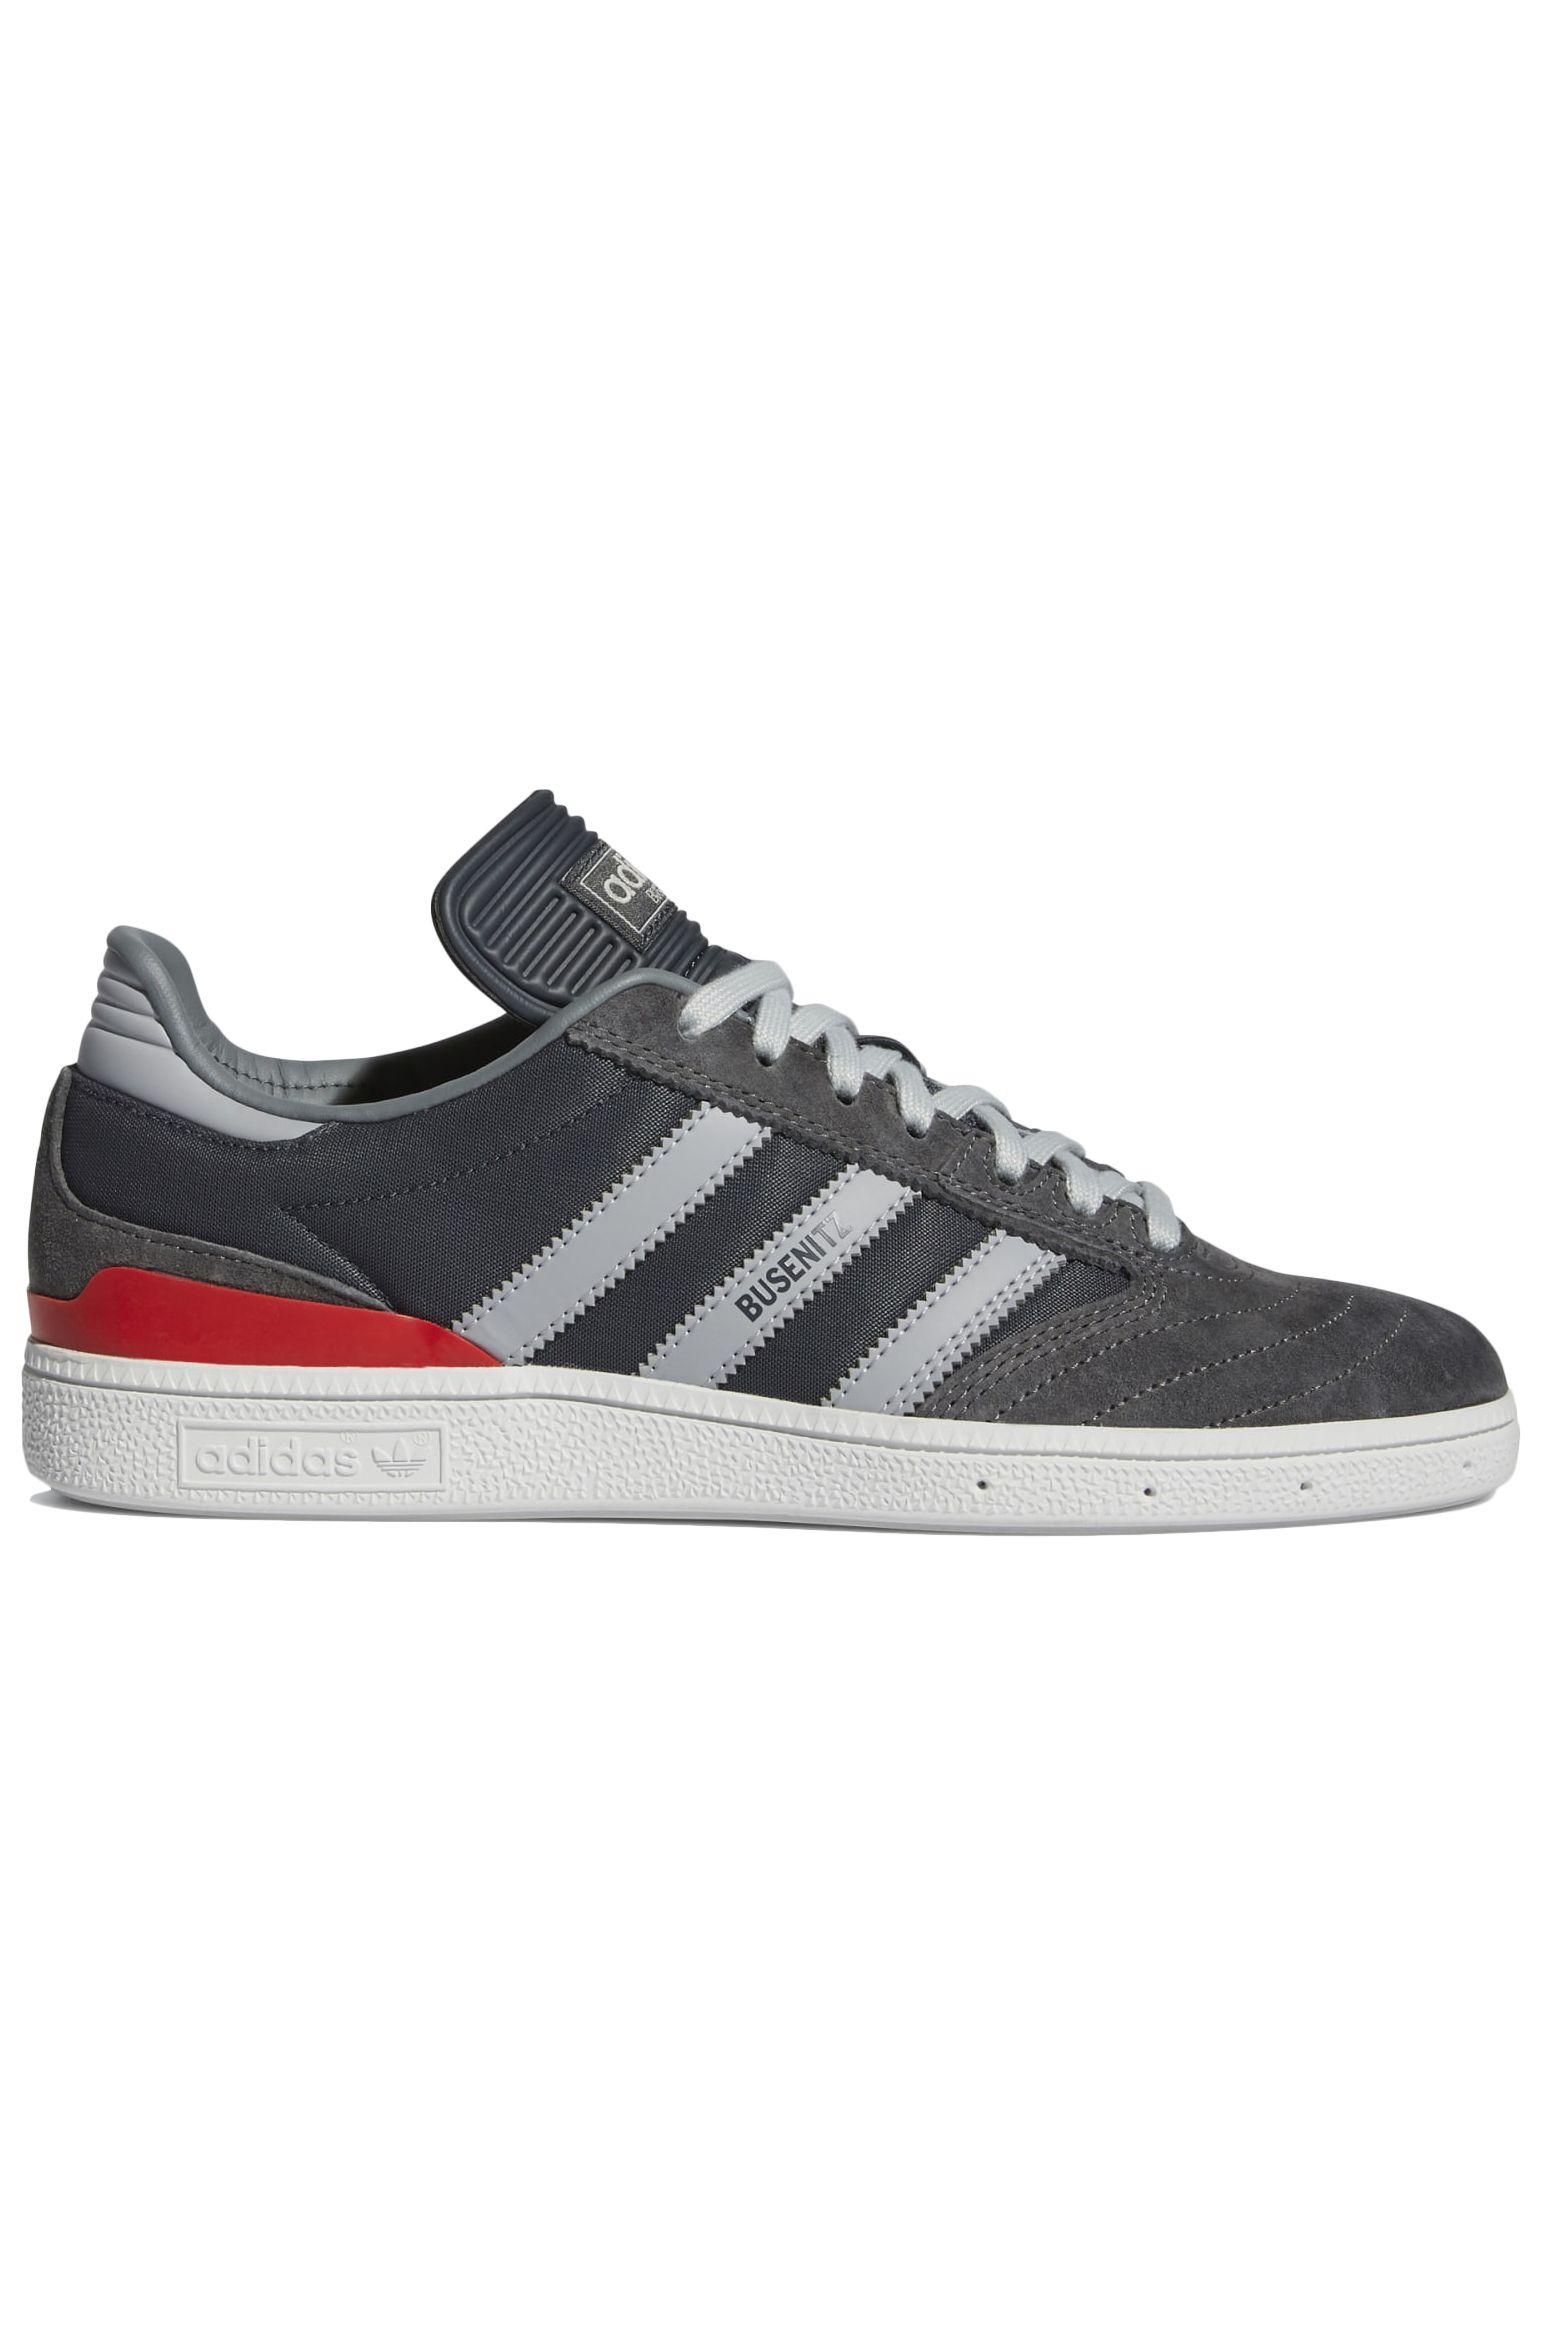 Adidas Shoes BUSENITZ Granite/Clear Onix/Dark Grey